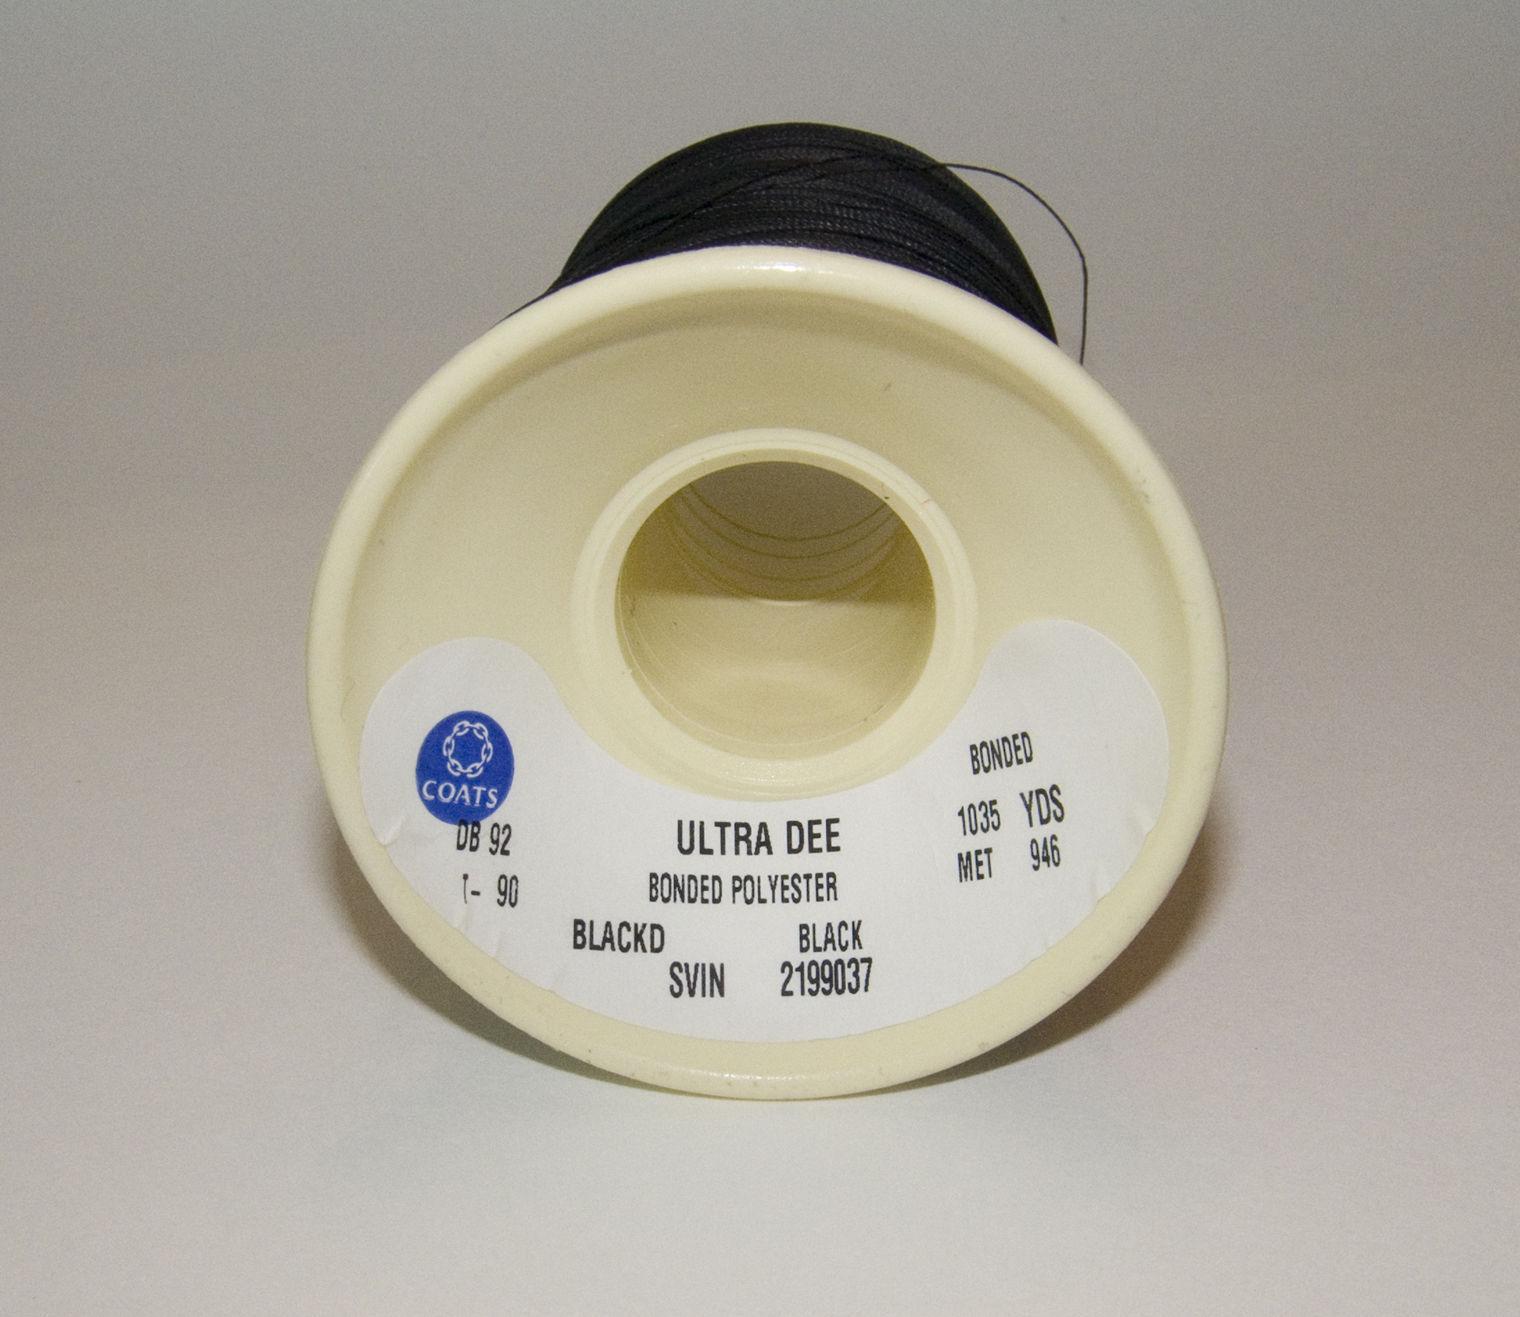 Thread, Polyester, Coats Bonded, Thread-4 oz. Spool, Black - Size DB-92 T-90